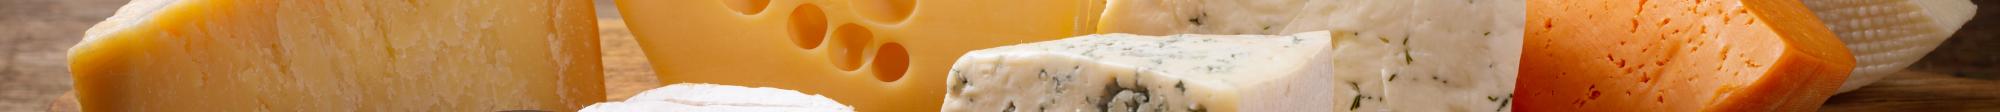 Comprar  quesos Irlanda gourmet online   Mixtura Gourmet